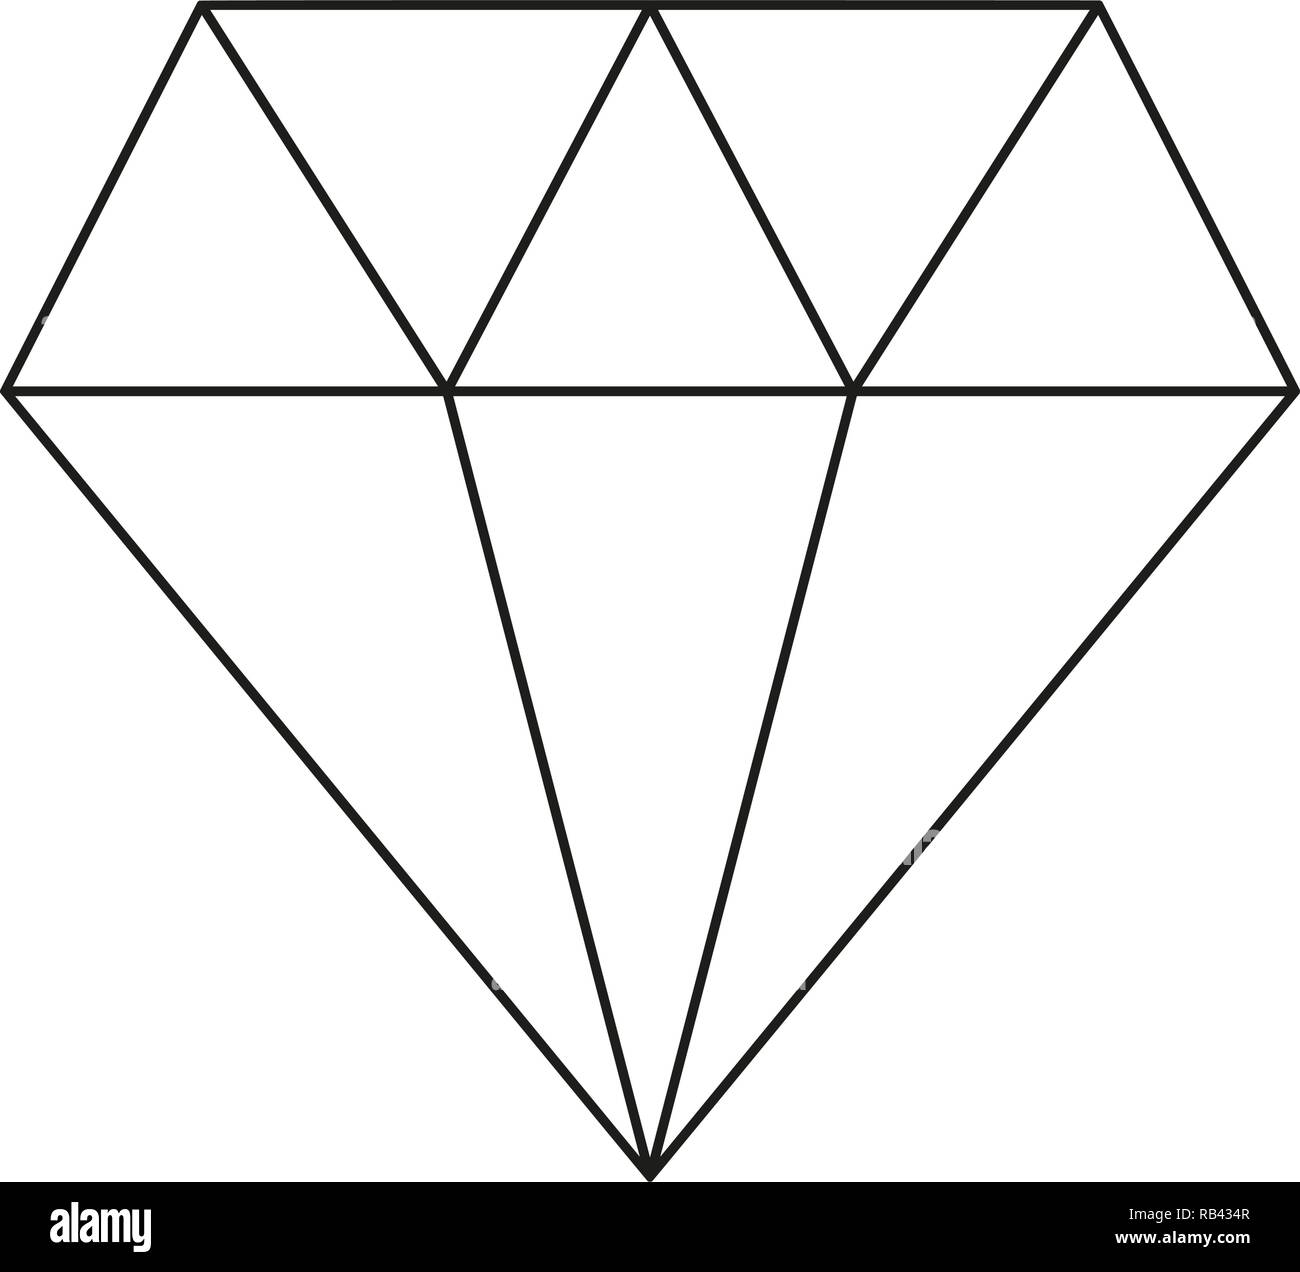 Line art black and white diamond - Stock Image